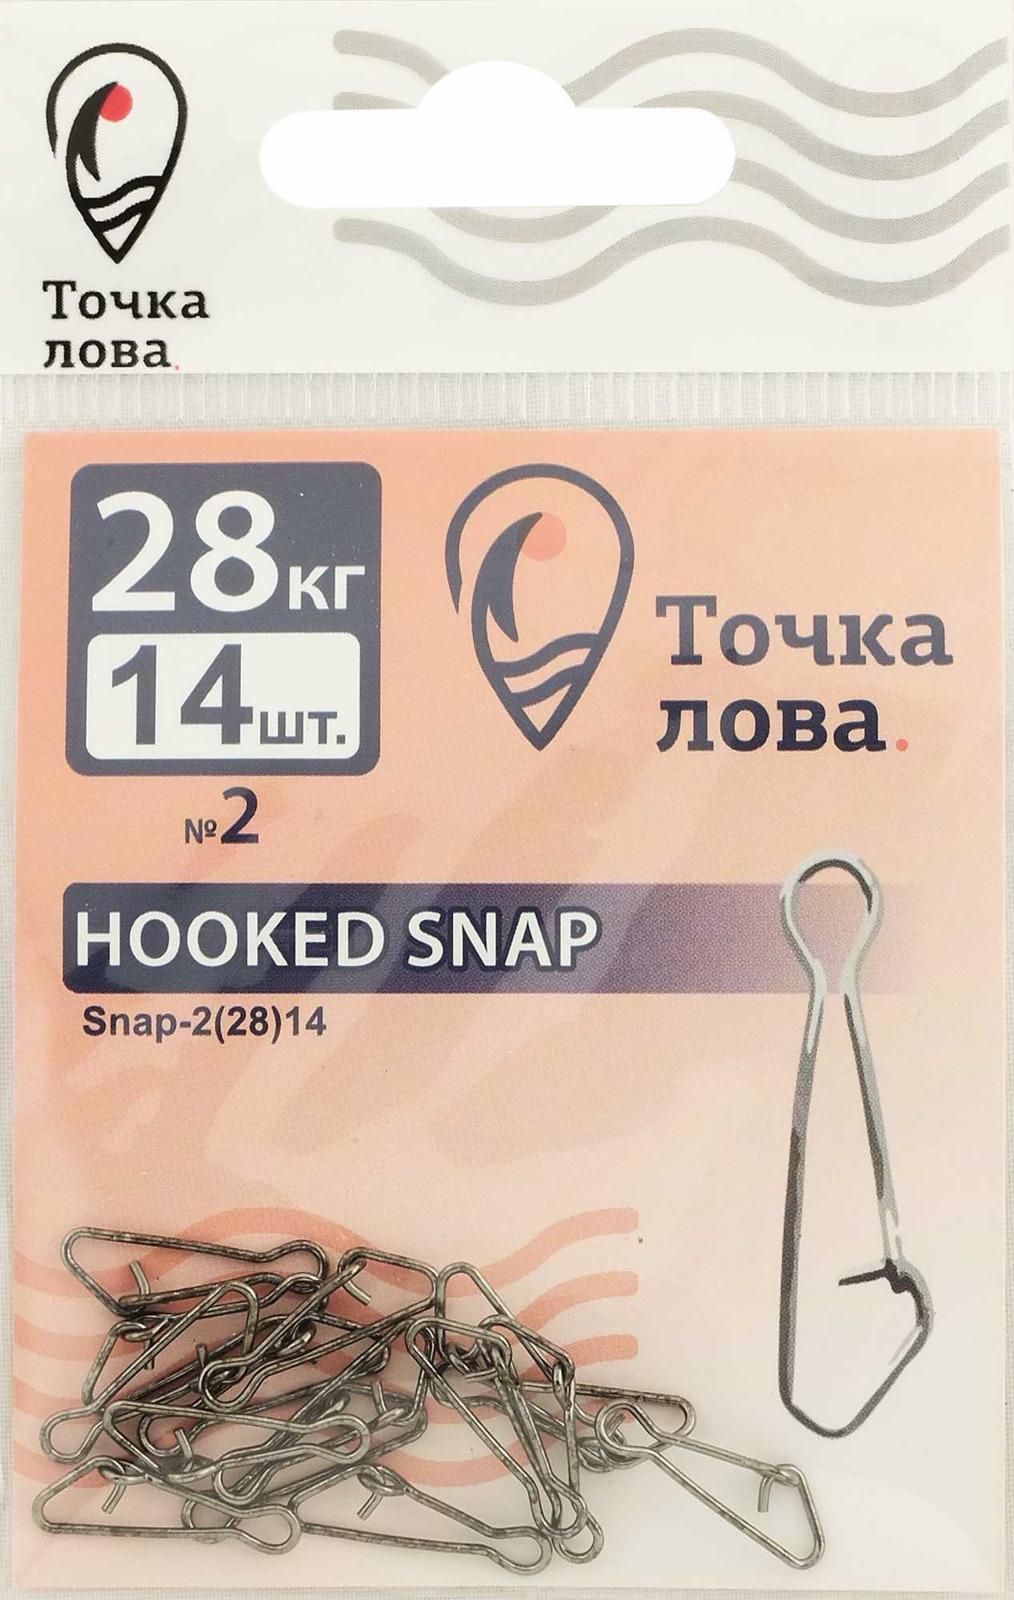 Аксессуар для рыбалки Точка Лова Застежка, Snap-2(28), 14 шт